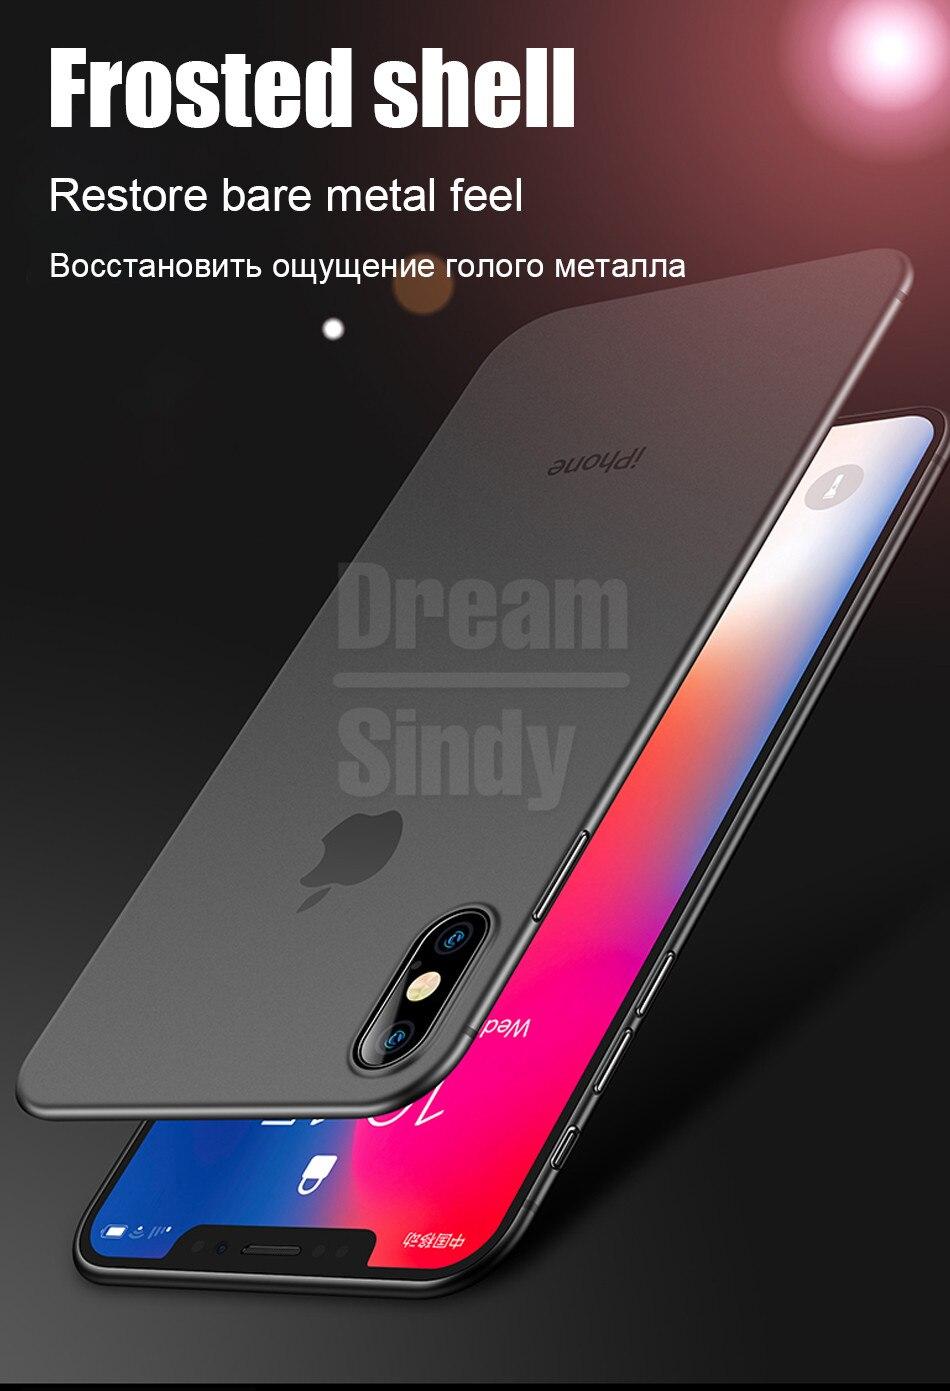 HTB1XrH8aBiE3KVjSZFMq6zQhVXab Ultra Thin Original Case For iphone